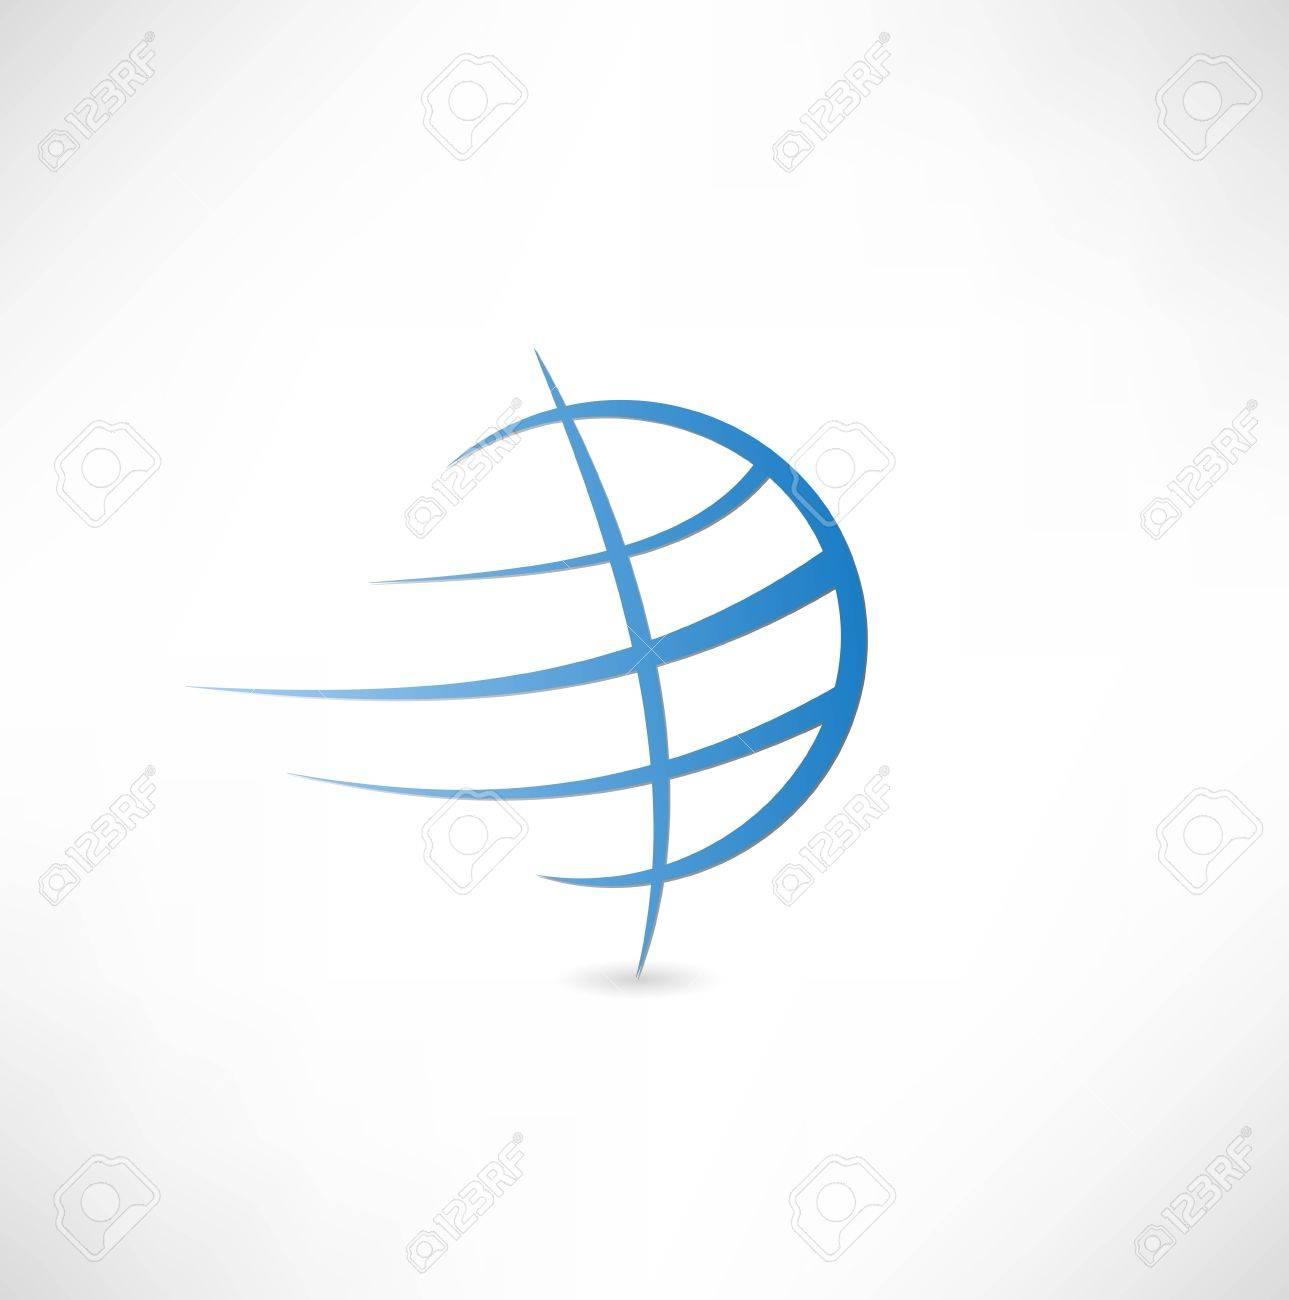 Planet earth icon Standard-Bild - 22660803